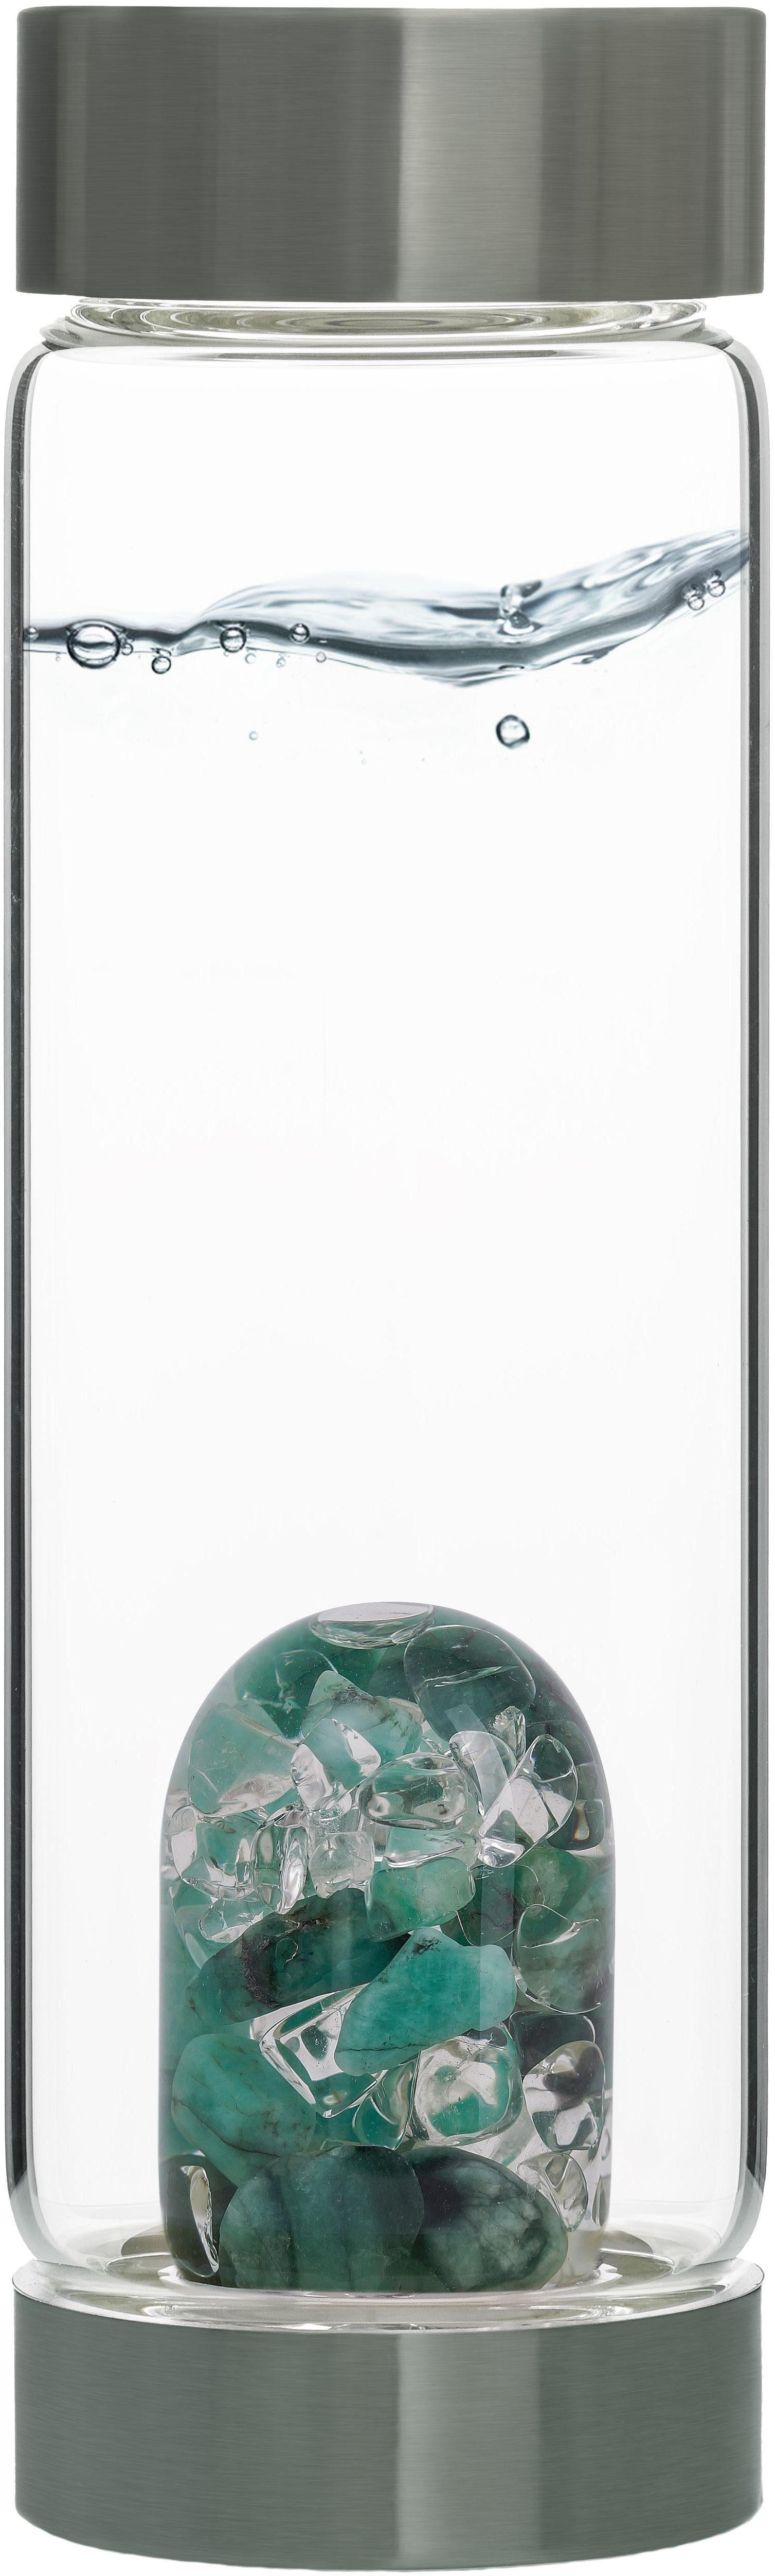 VitaJuwel Wasserkaraffe »Edelsteinflasche ViA Vitality«, (Smaragd - Bergkristall)